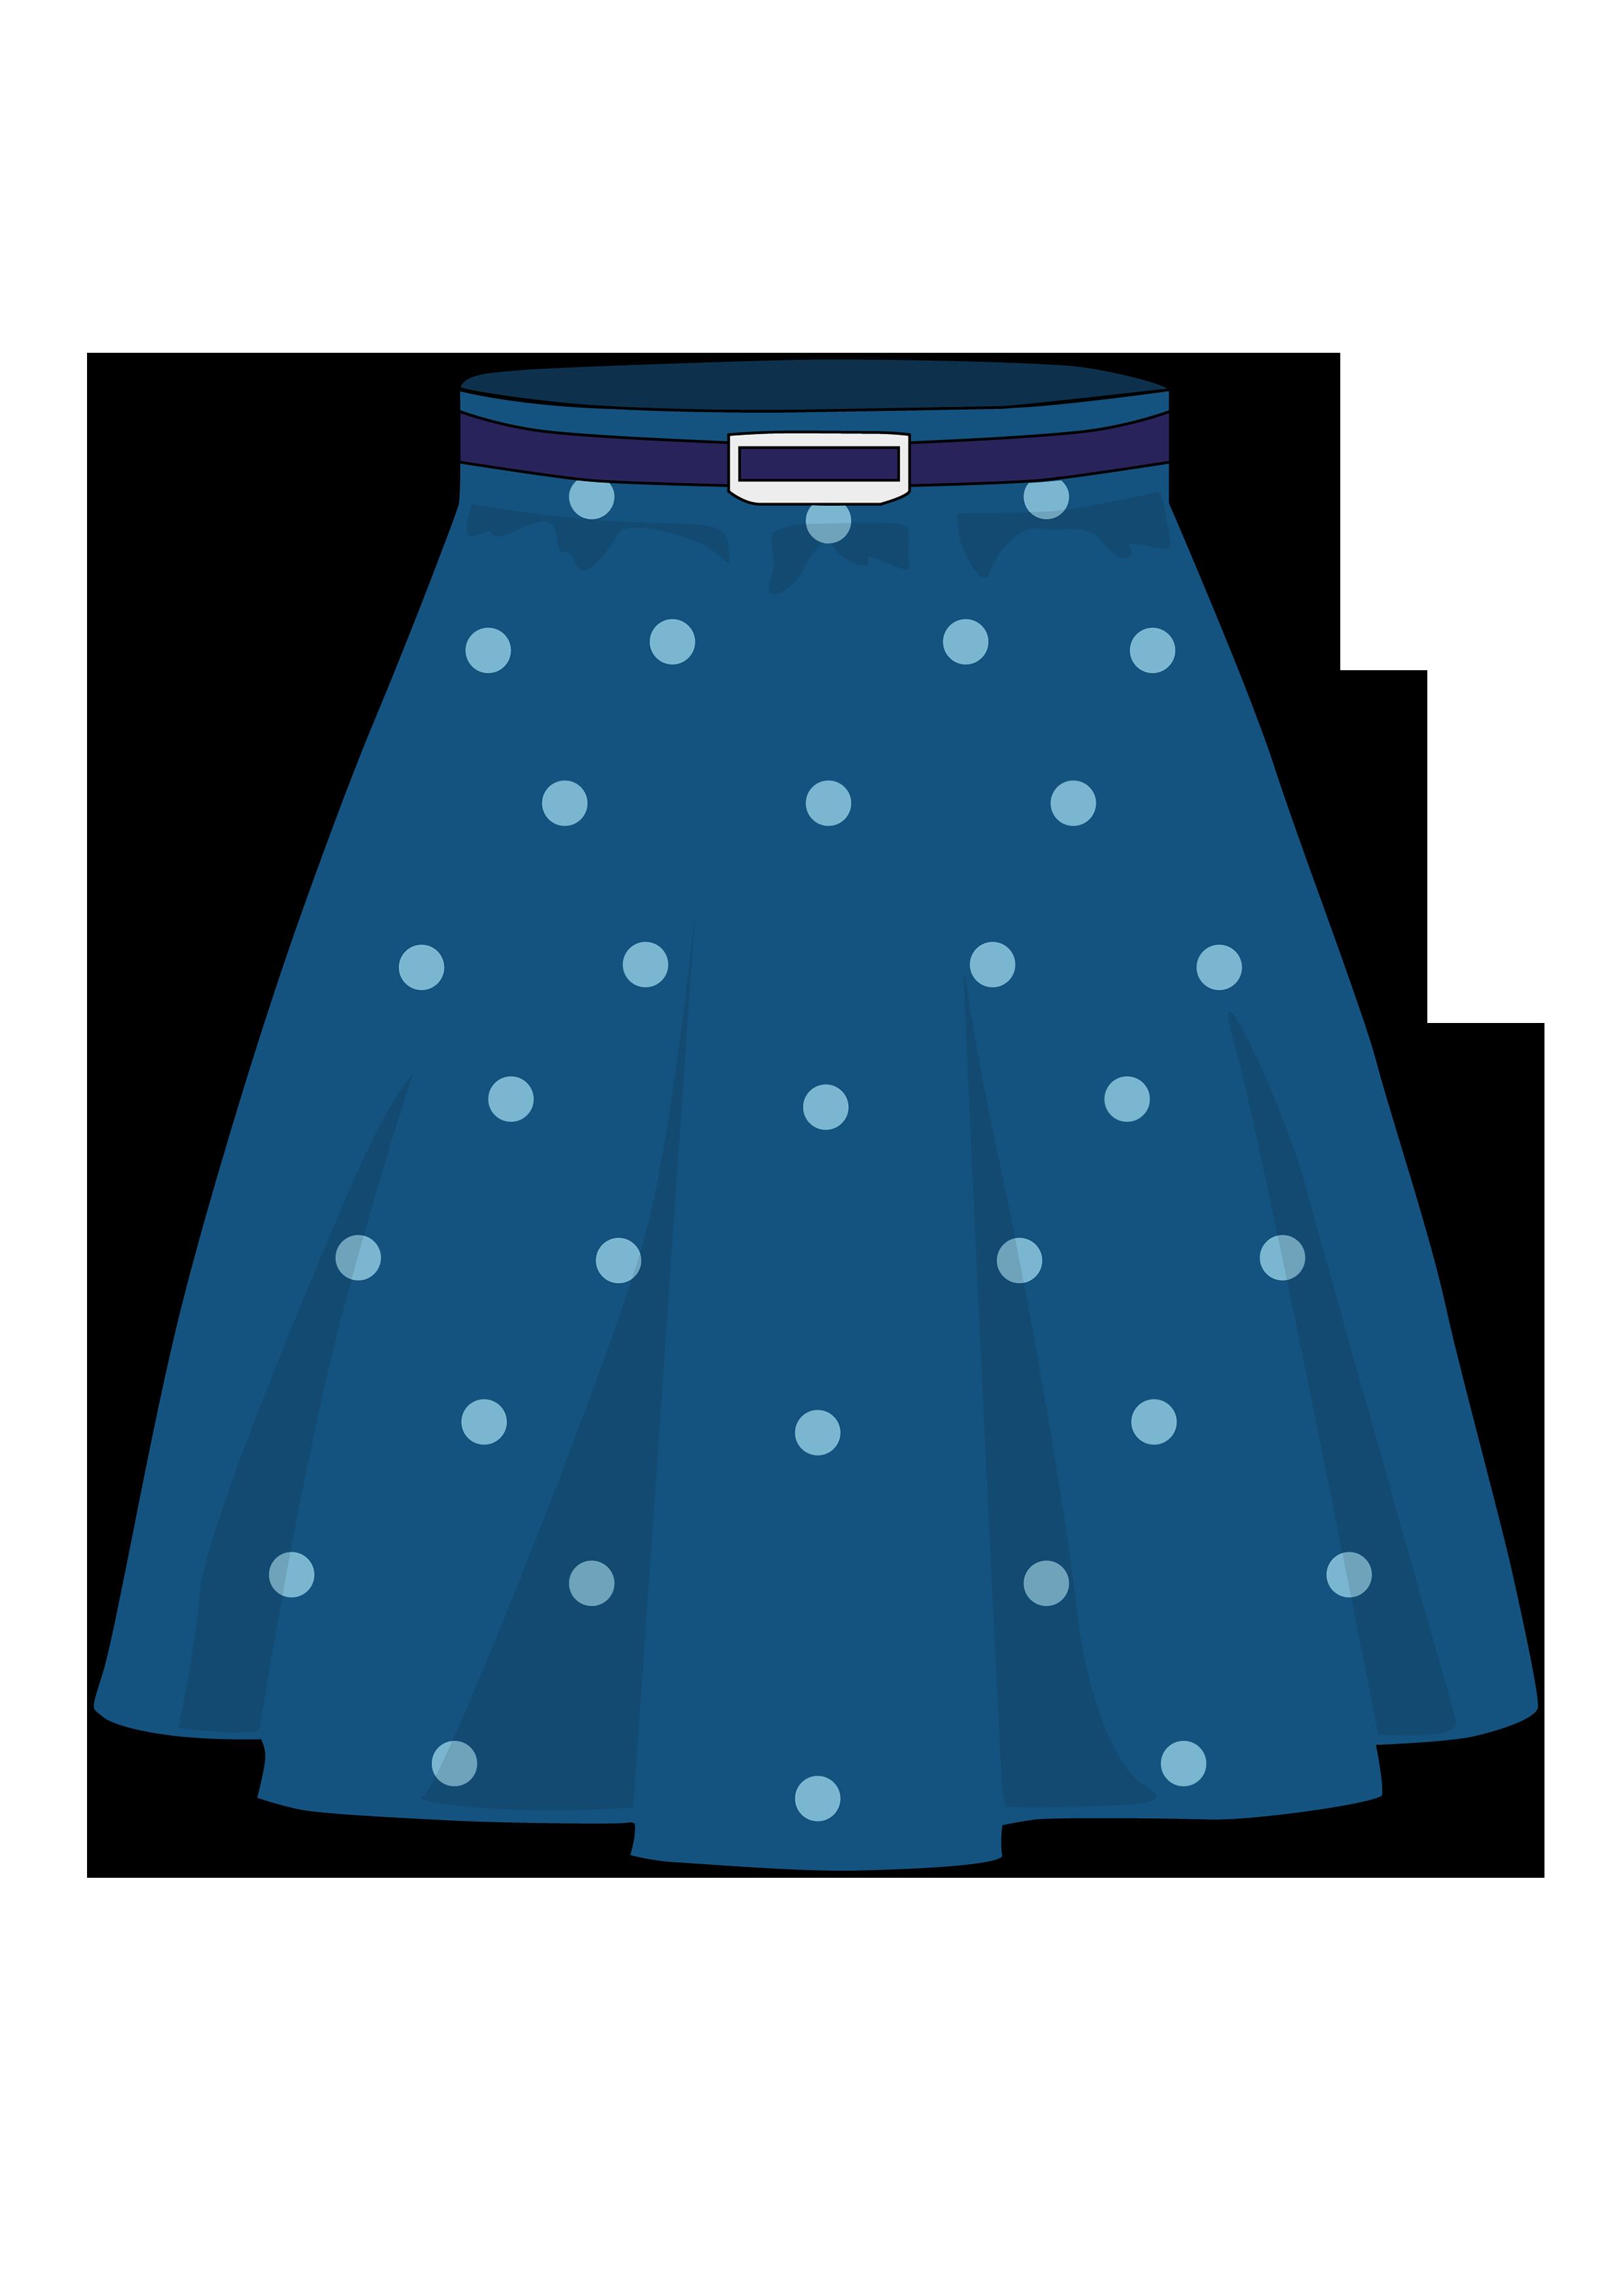 Resultado de imagen de falda dibujo png | Png | Pinterest | Imagenes ...